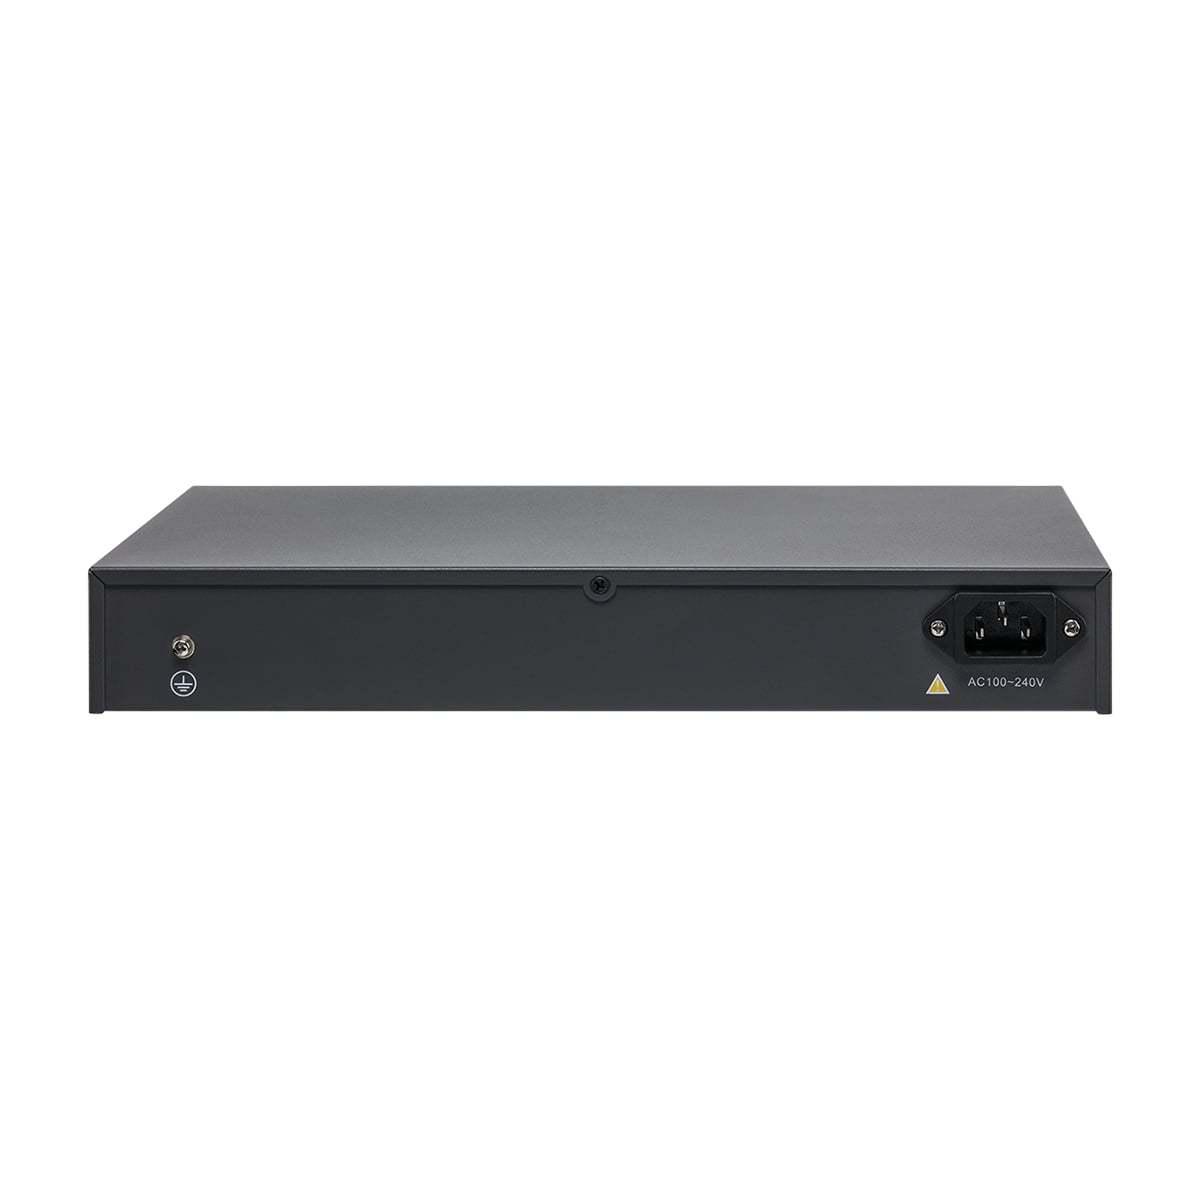 Switch Gerenciável 24P InteFAST+2P GIGABIT+2P GBIC-SF Intelbras 2622MR L2